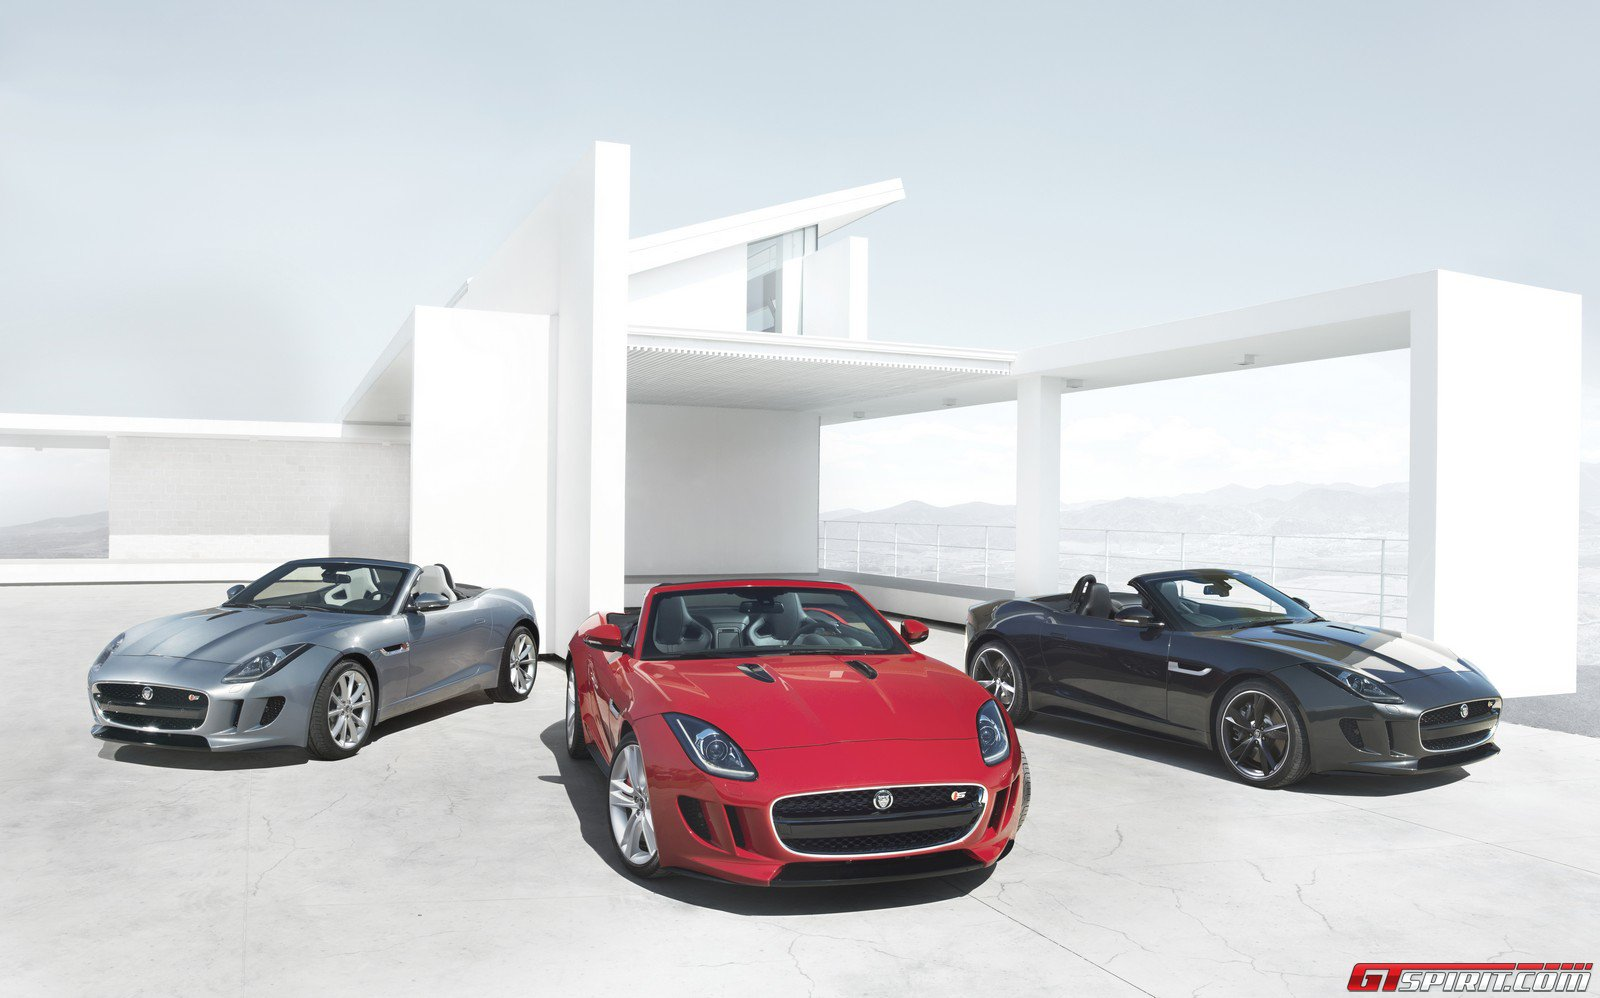 Jaguar F-Type - Exterior Photo 1